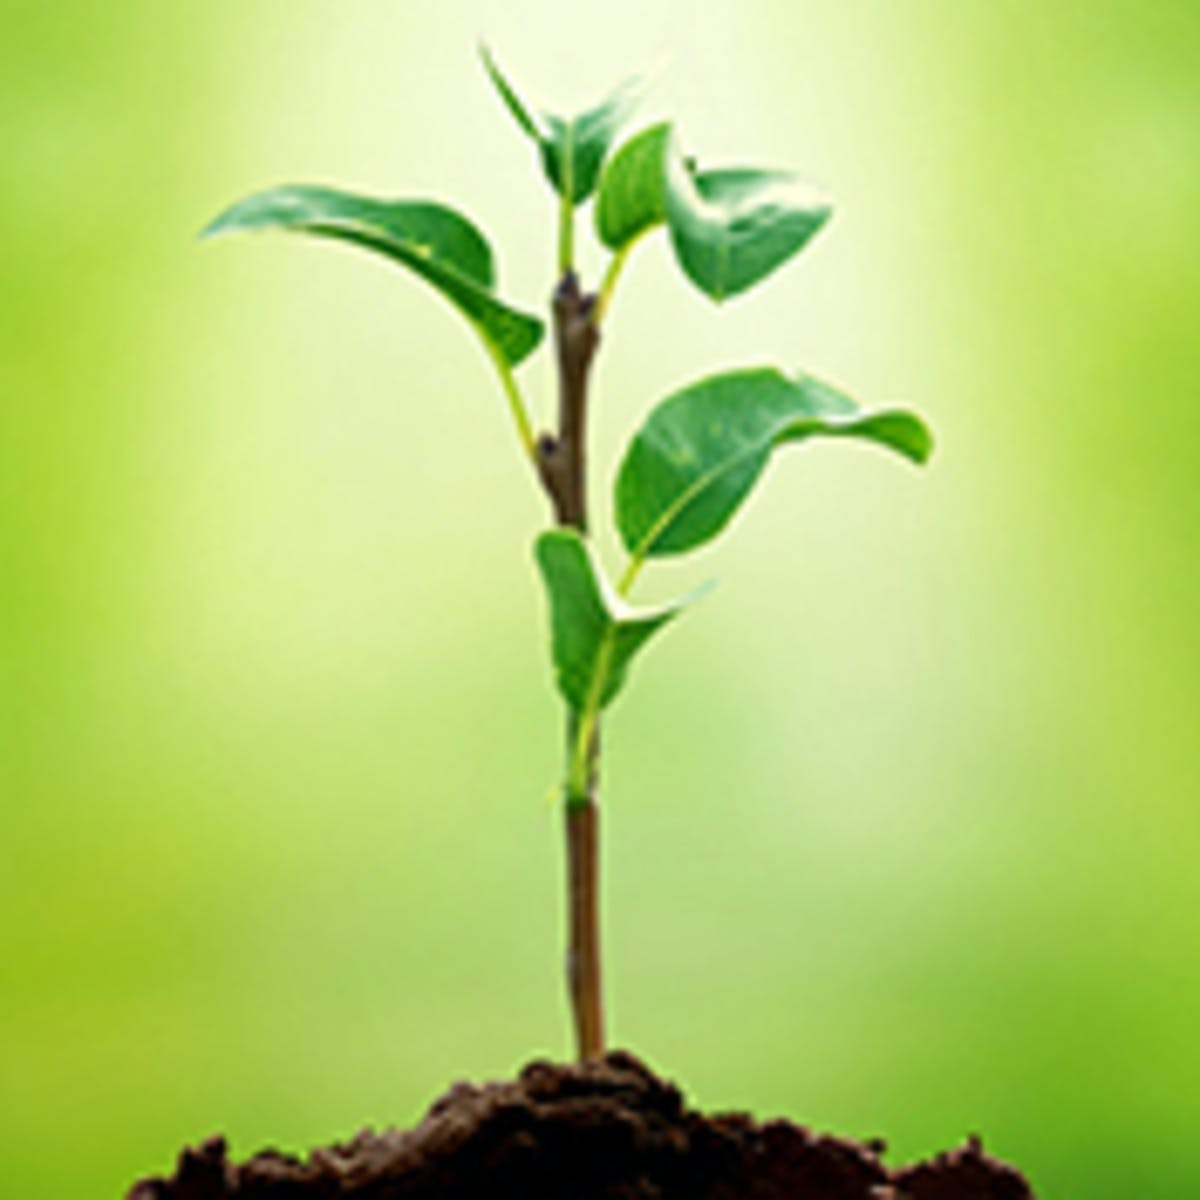 Understanding Plants - Part I: What a Plant Knows